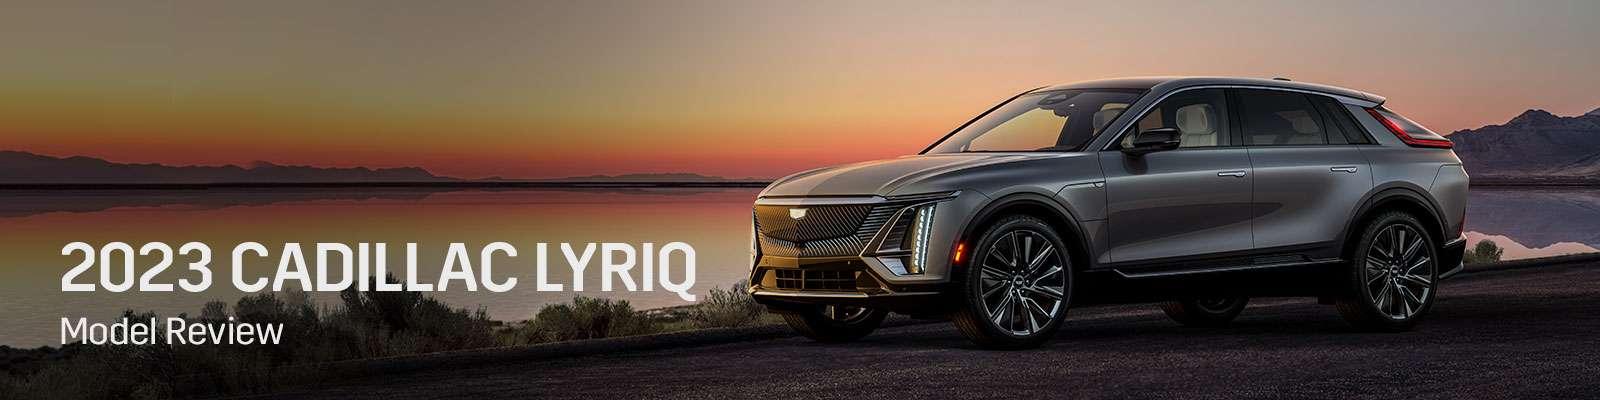 2023 Cadillac Lyriq Model Overview - Germain Cadillac of Easton